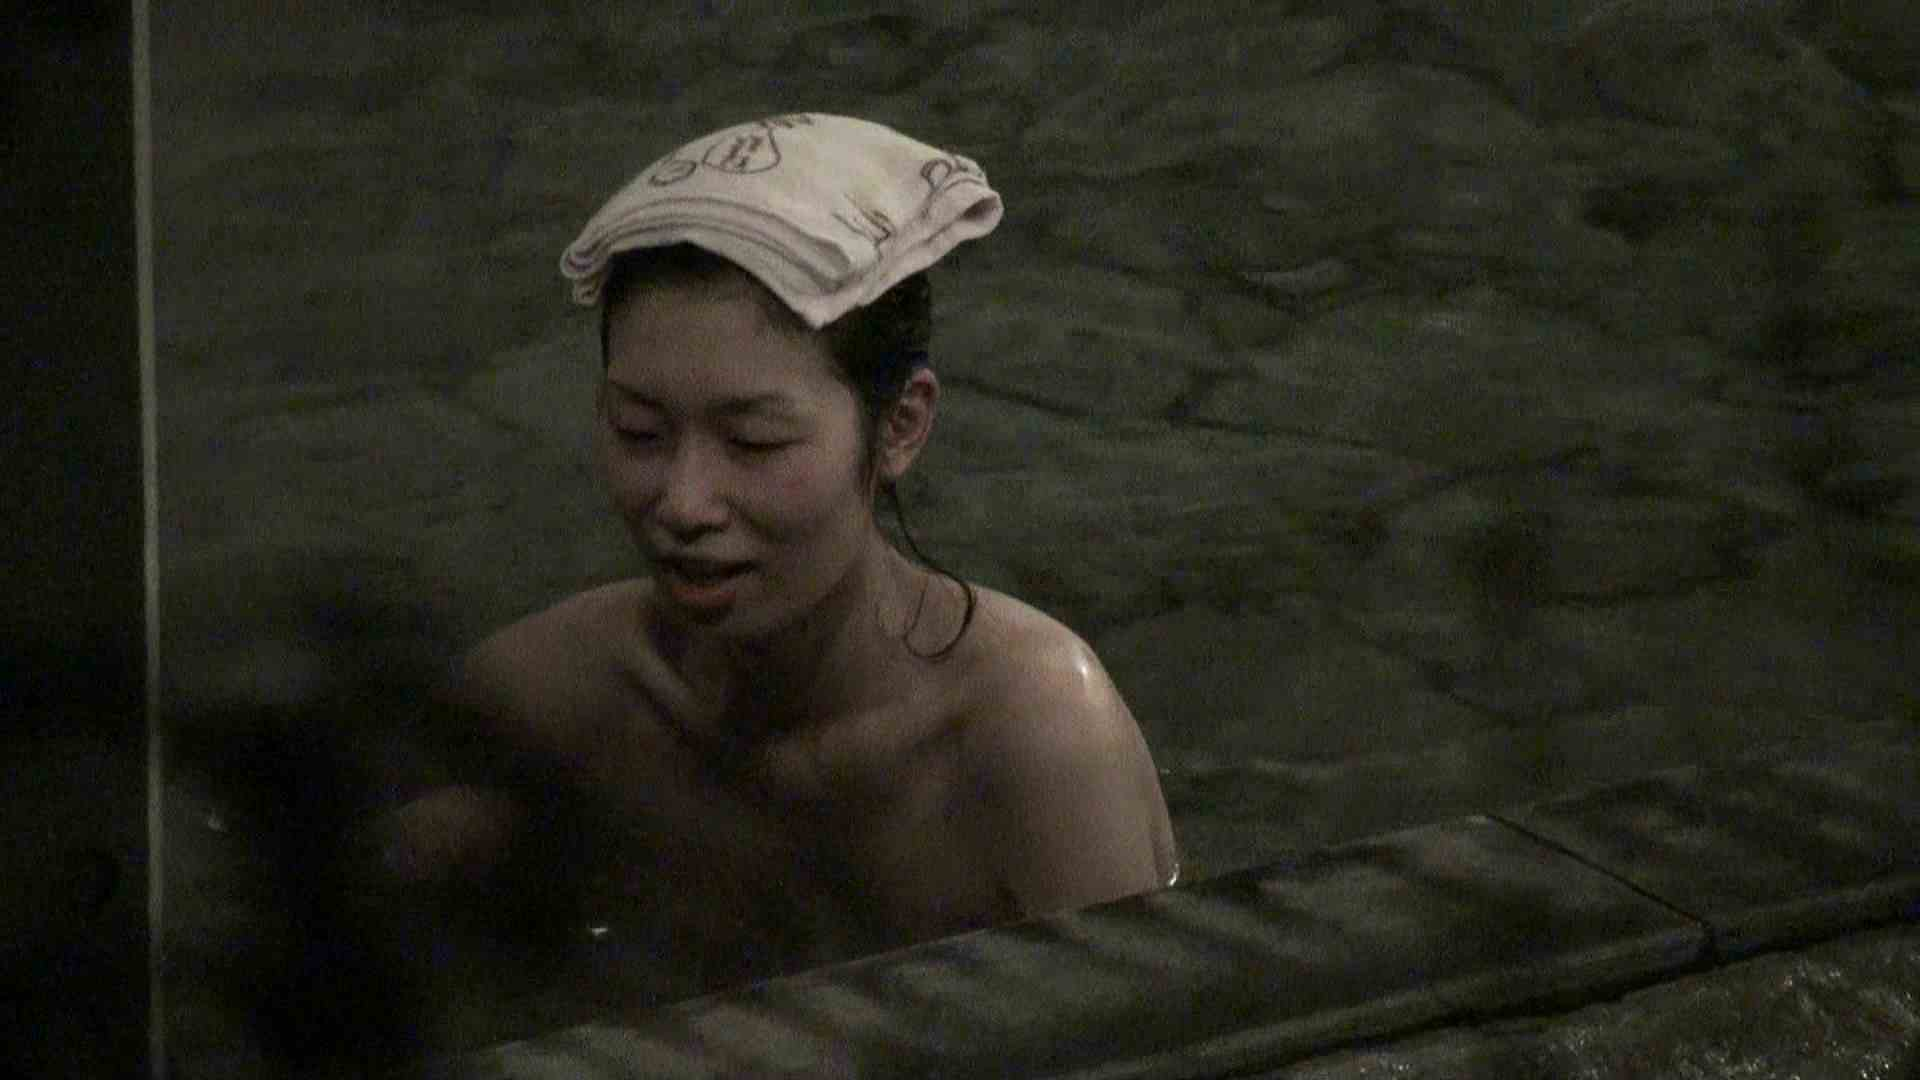 Aquaな露天風呂Vol.399 盗撮シリーズ | 露天風呂編  85PIX 85